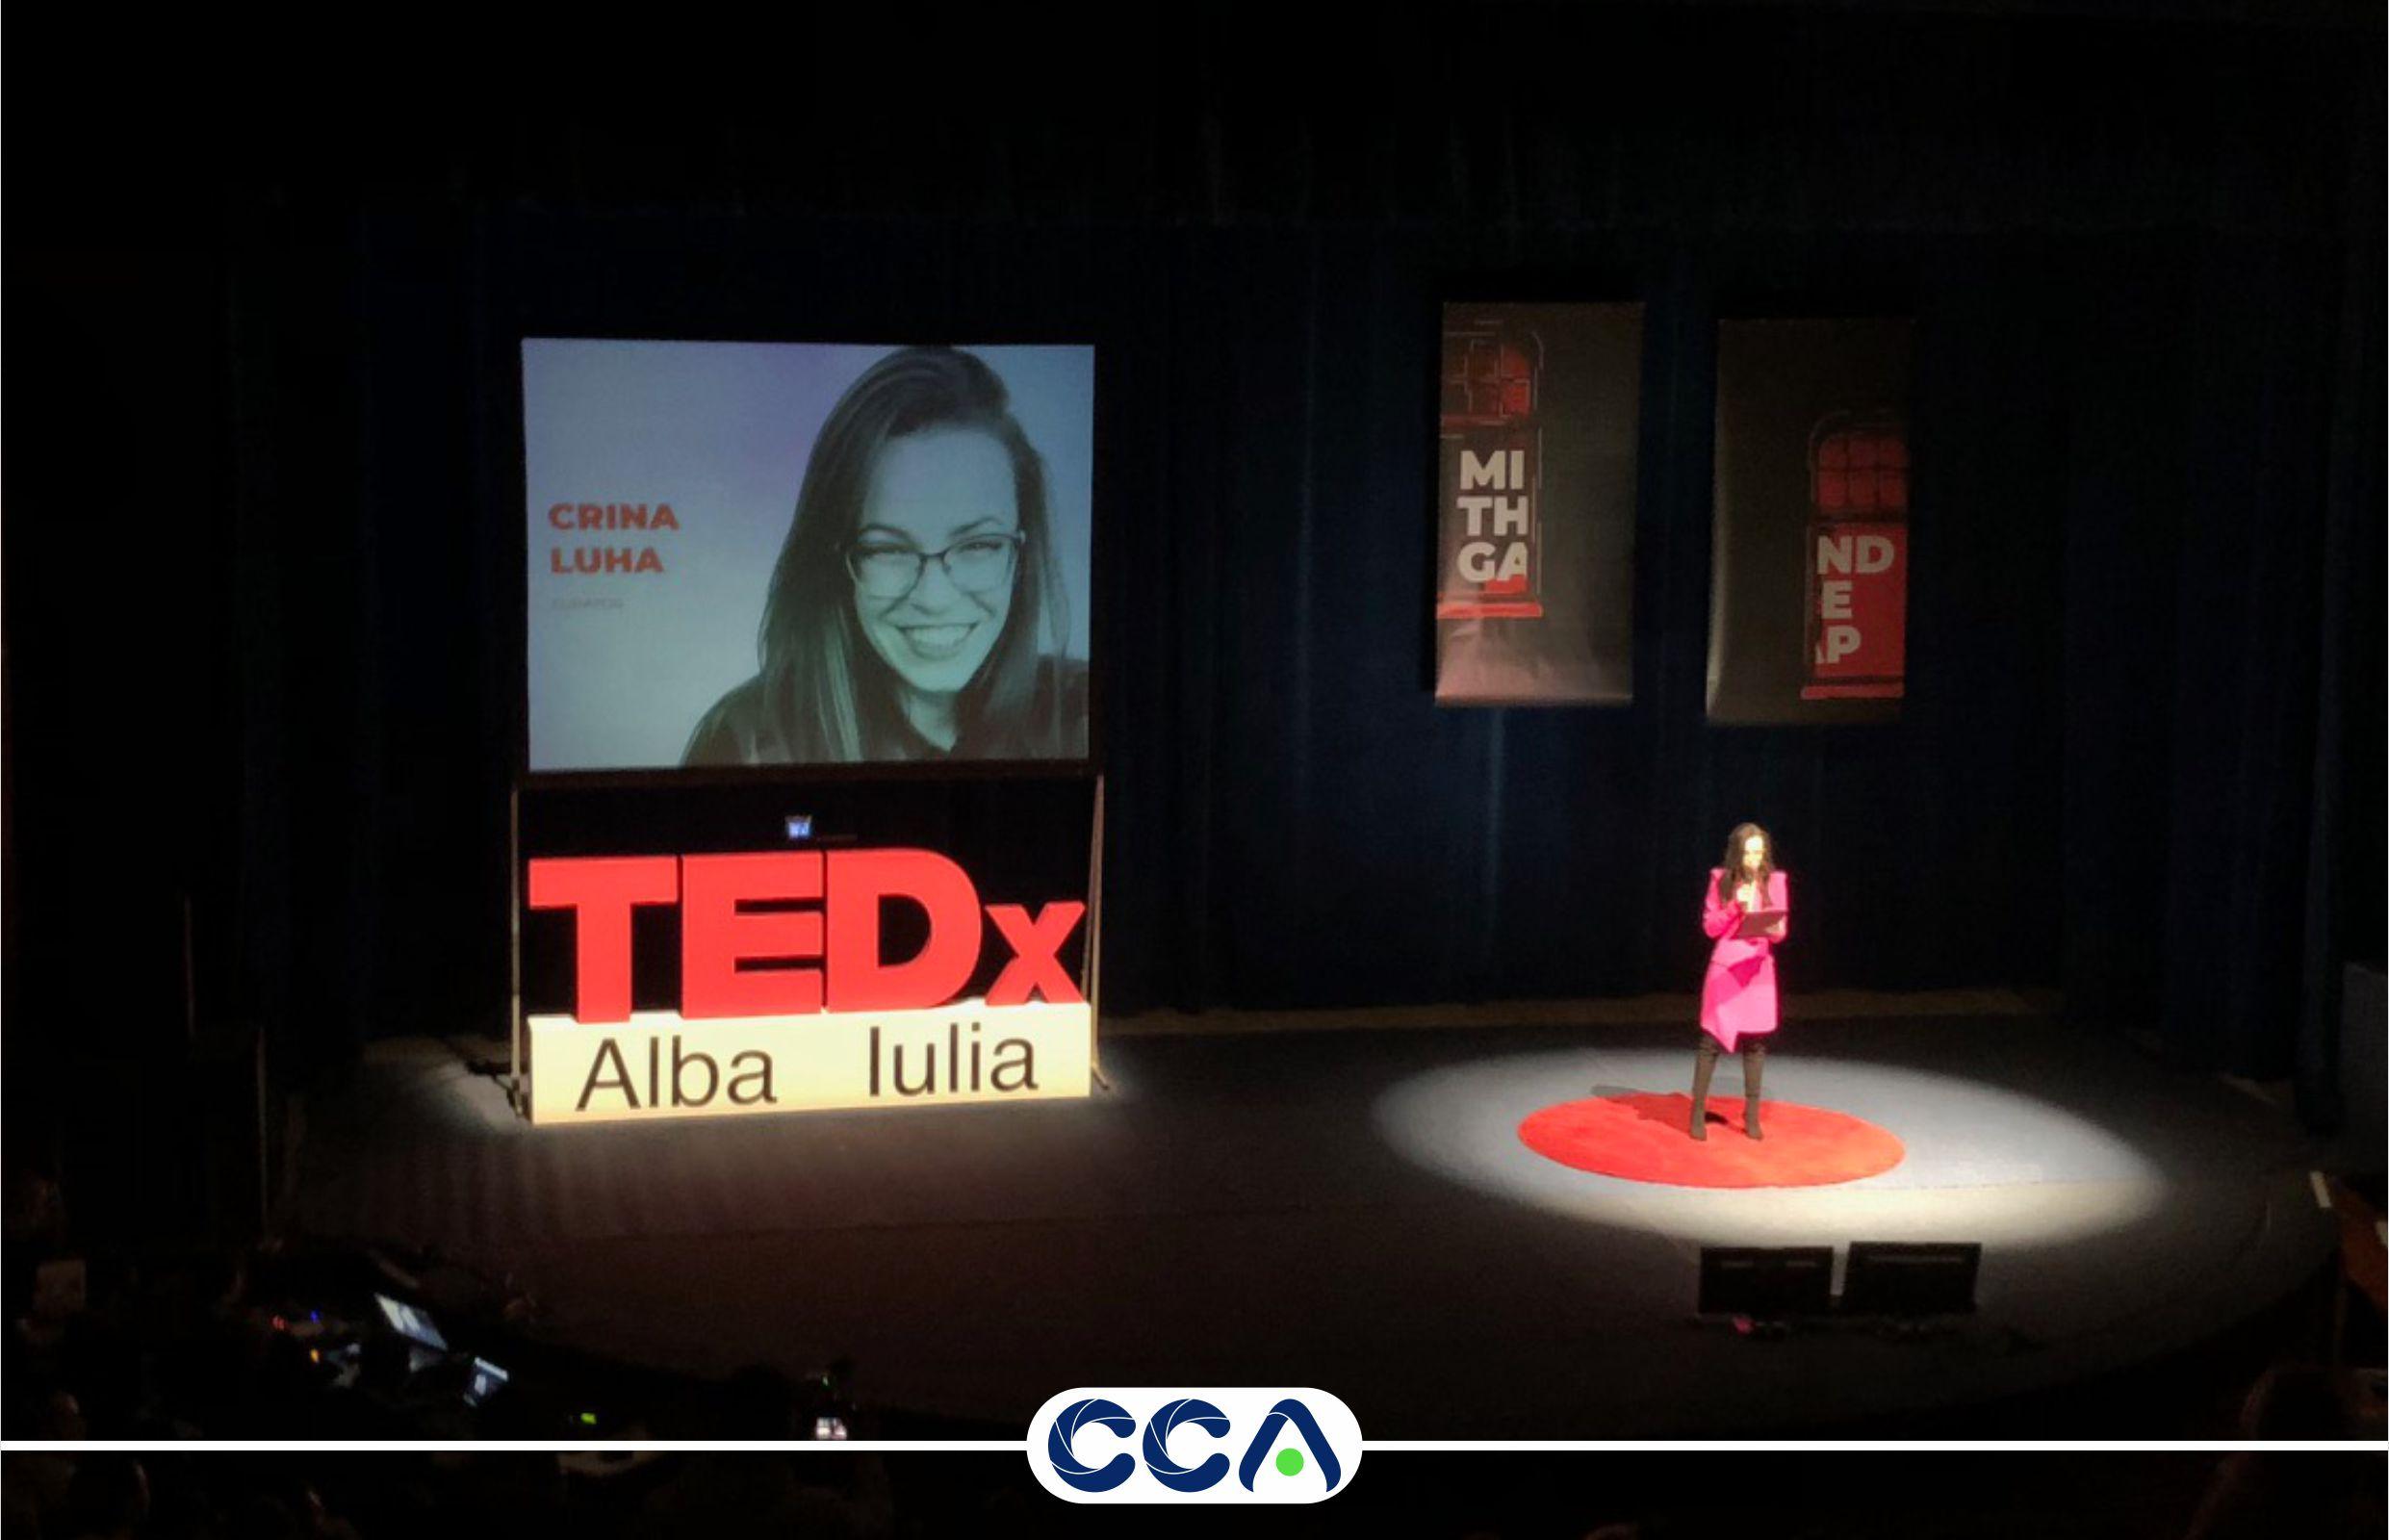 TedX Alba Iulia